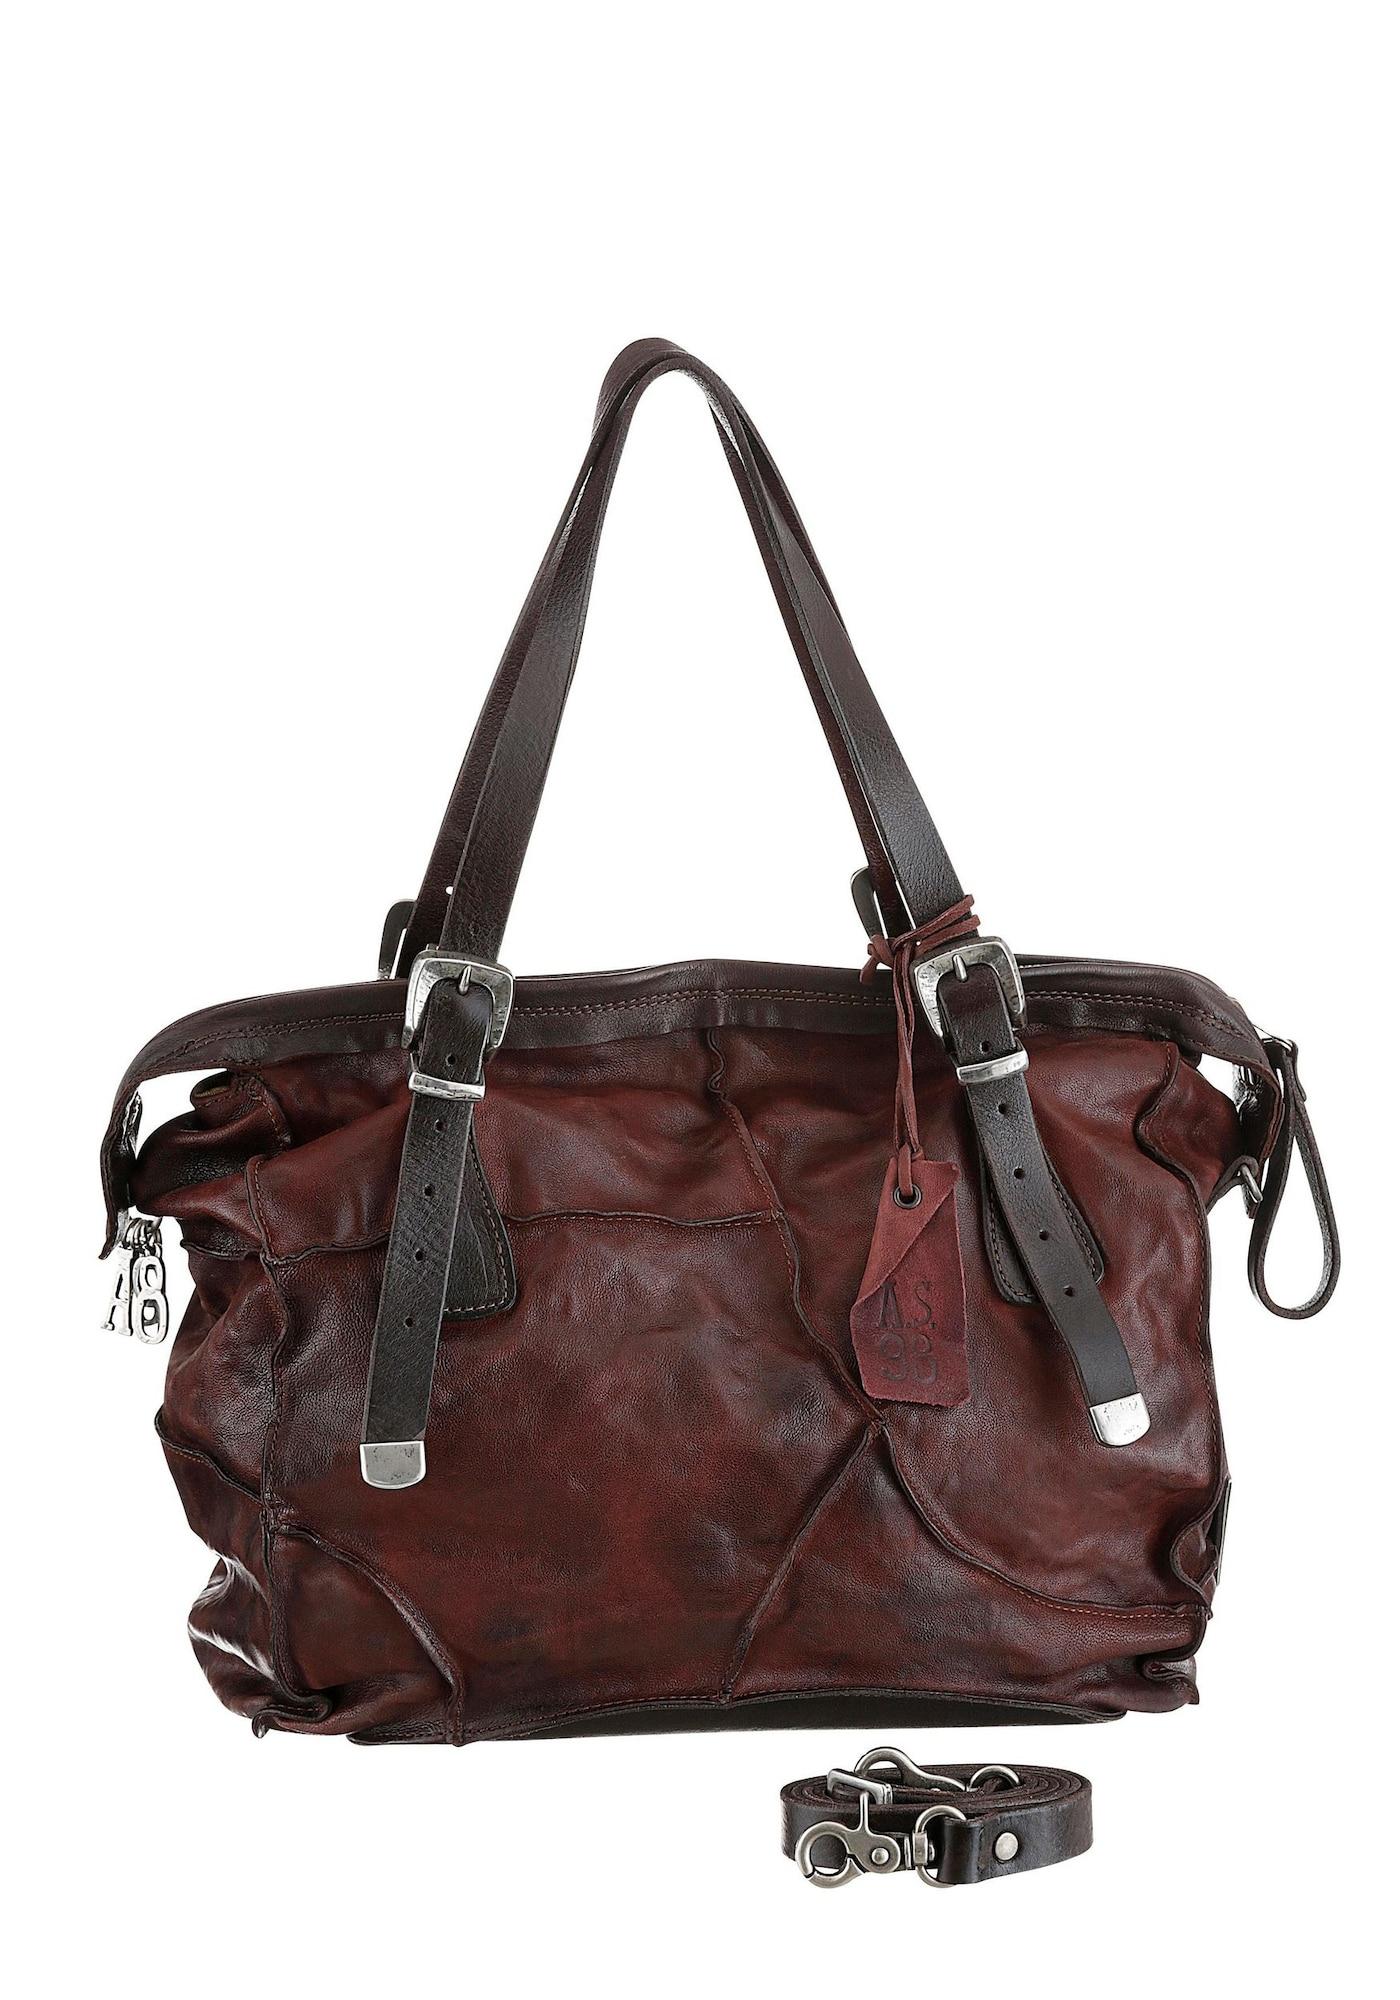 Henkeltasche | Taschen > Handtaschen > Henkeltaschen | a.s.98